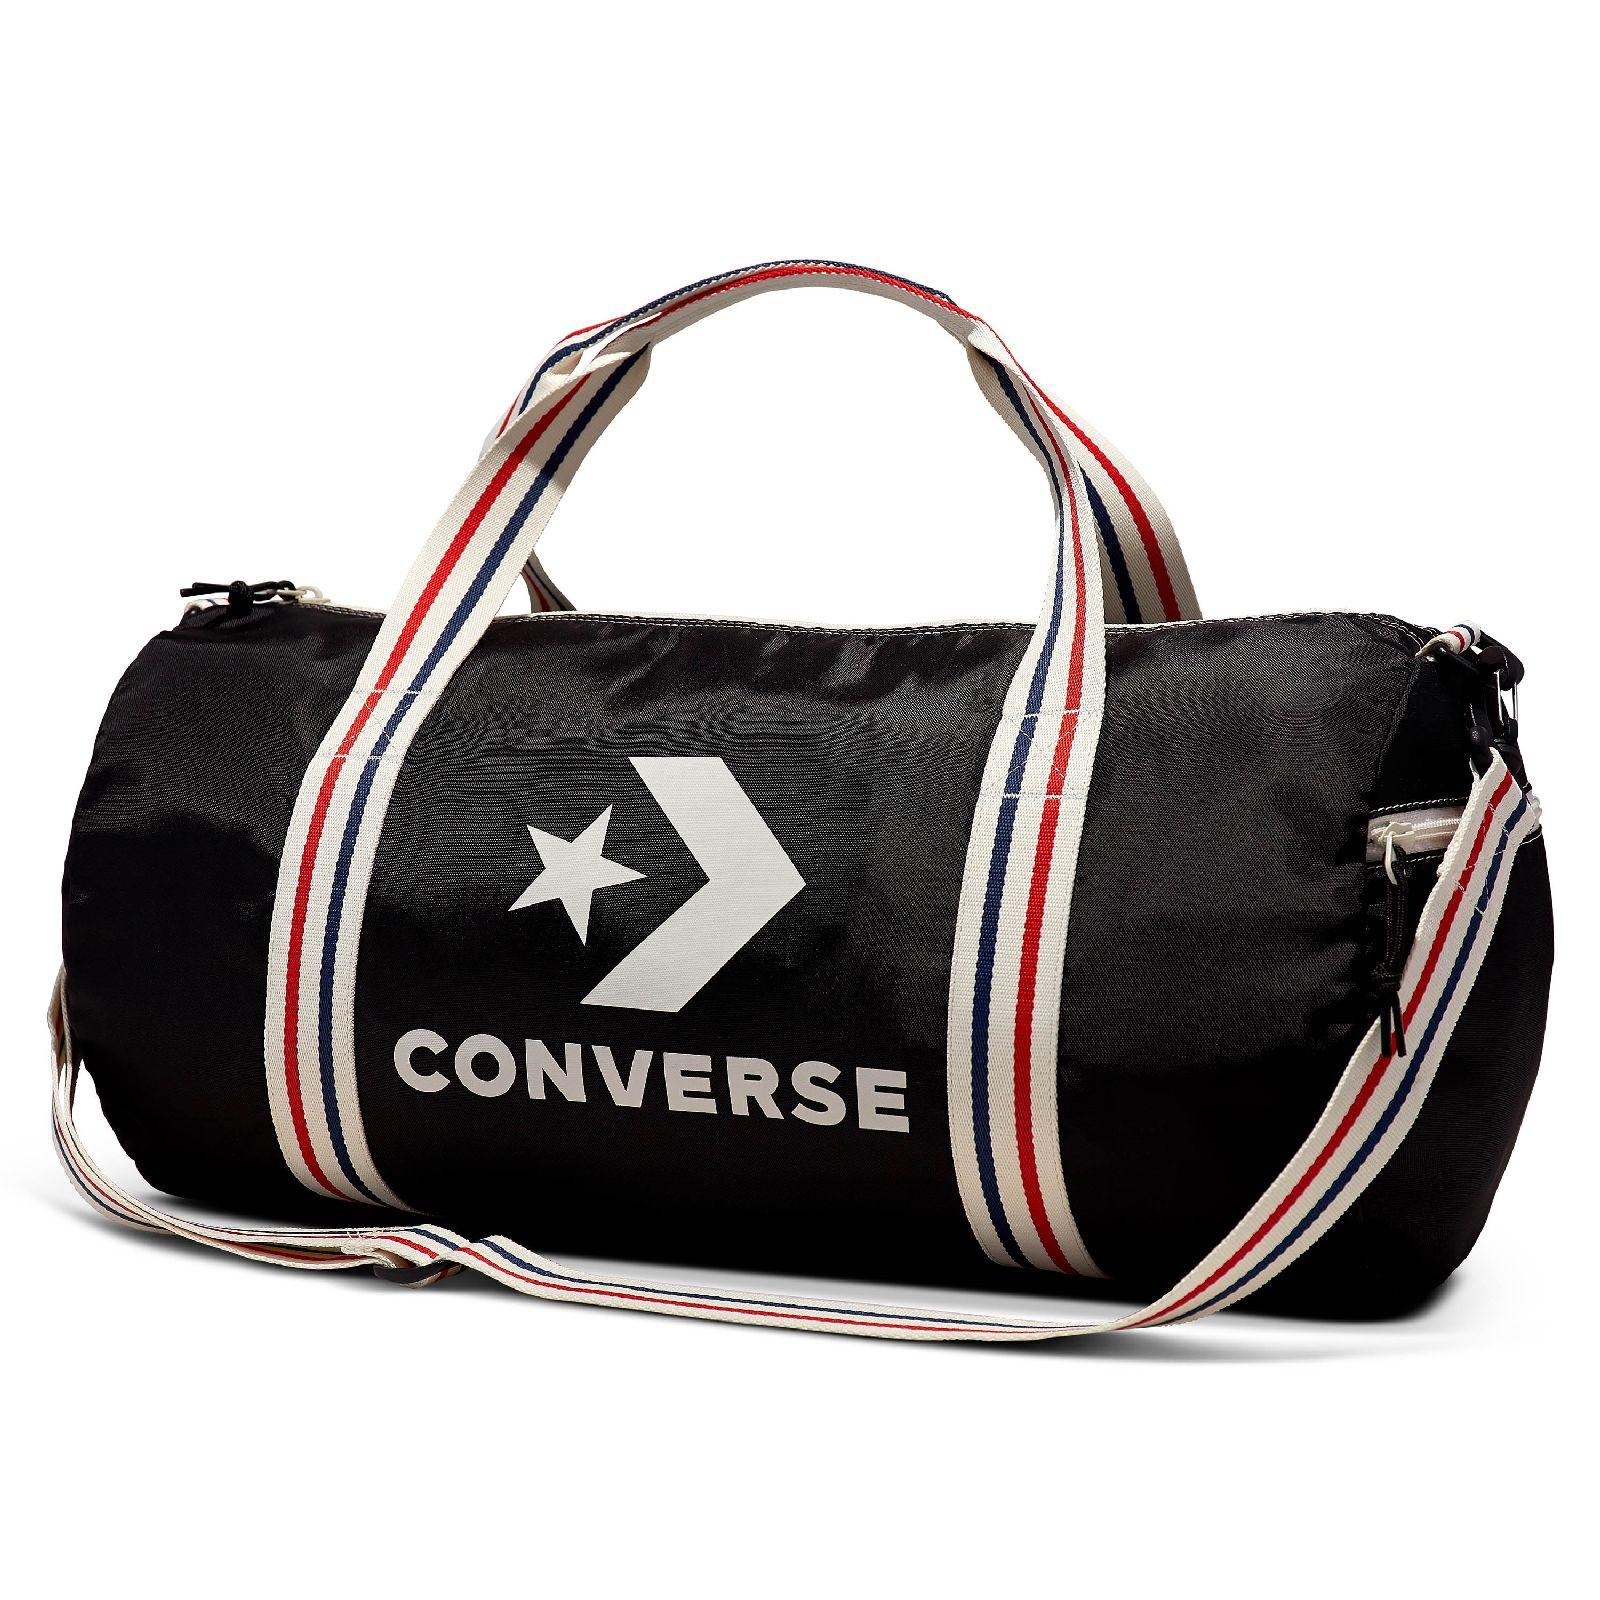 89490cddcaac Buy Converse Shoes